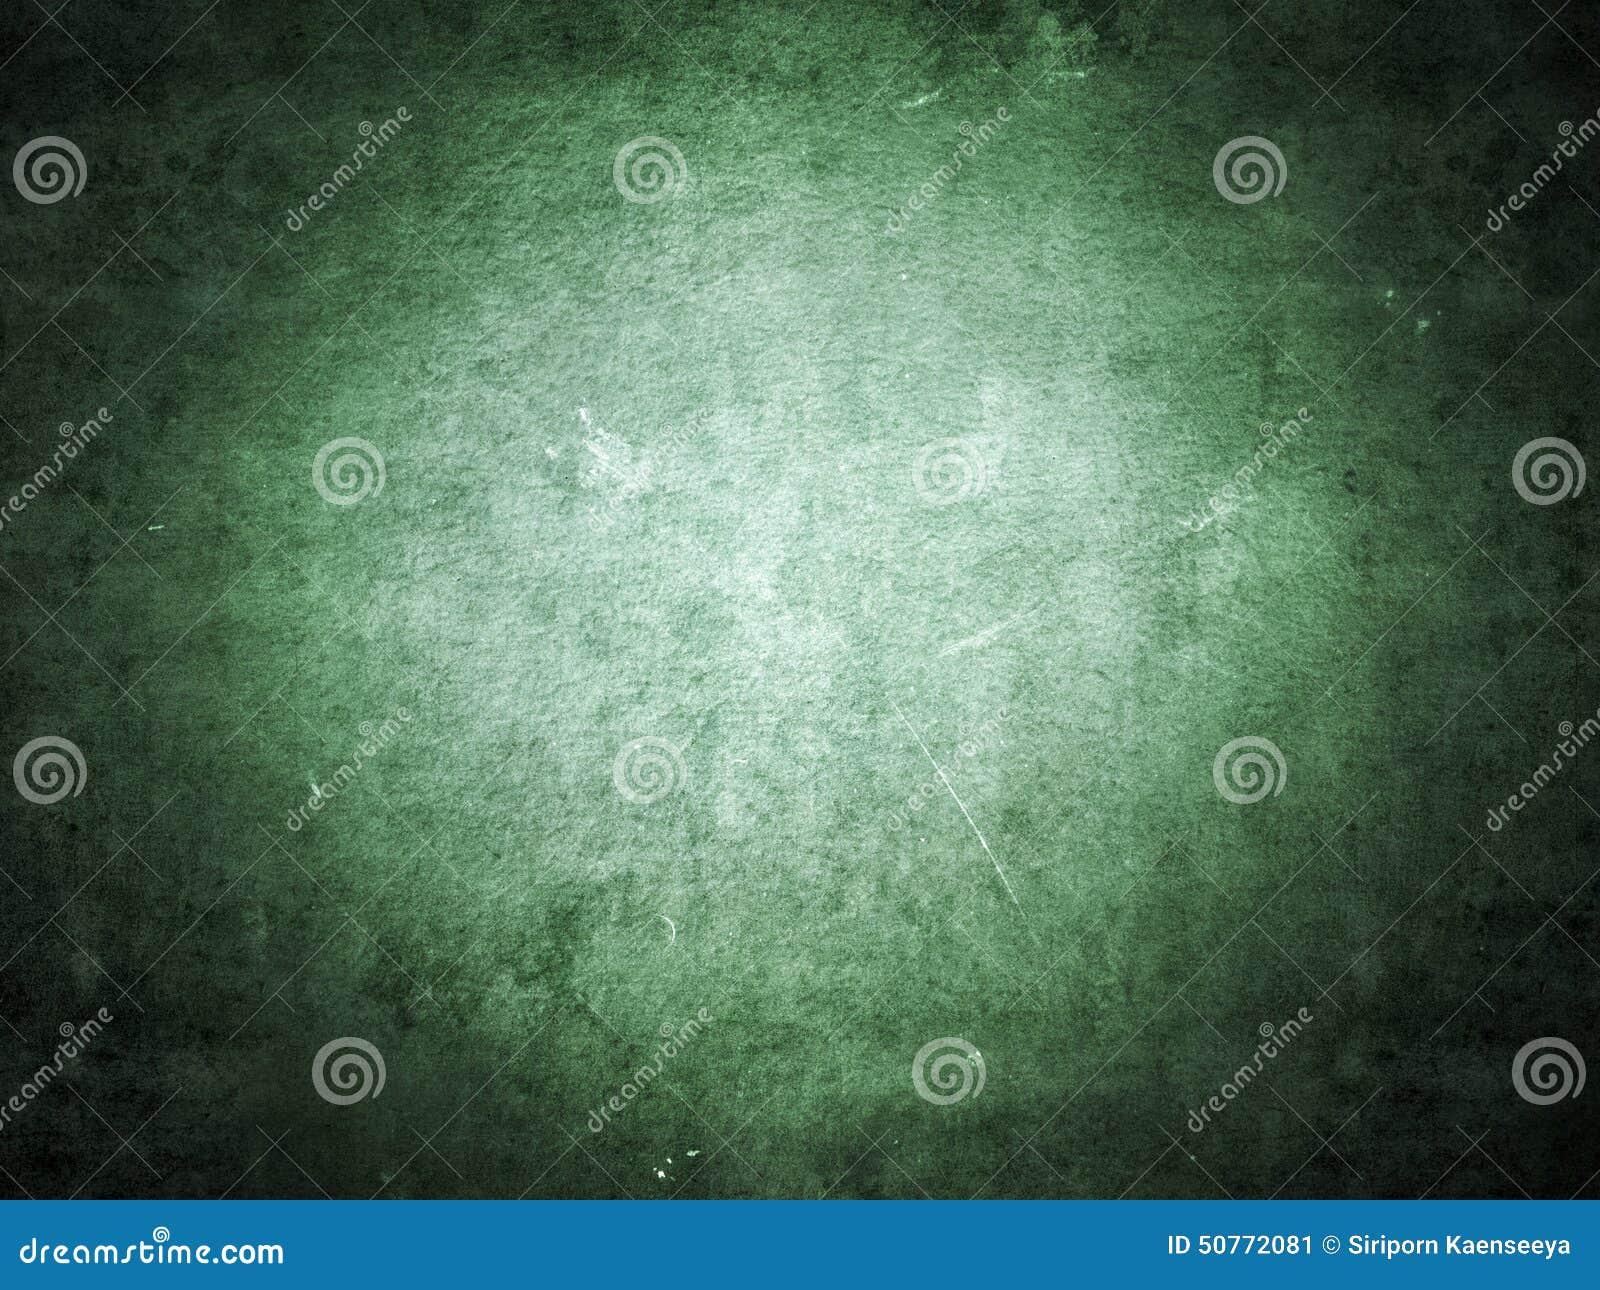 green grunge texture thumb - photo #27